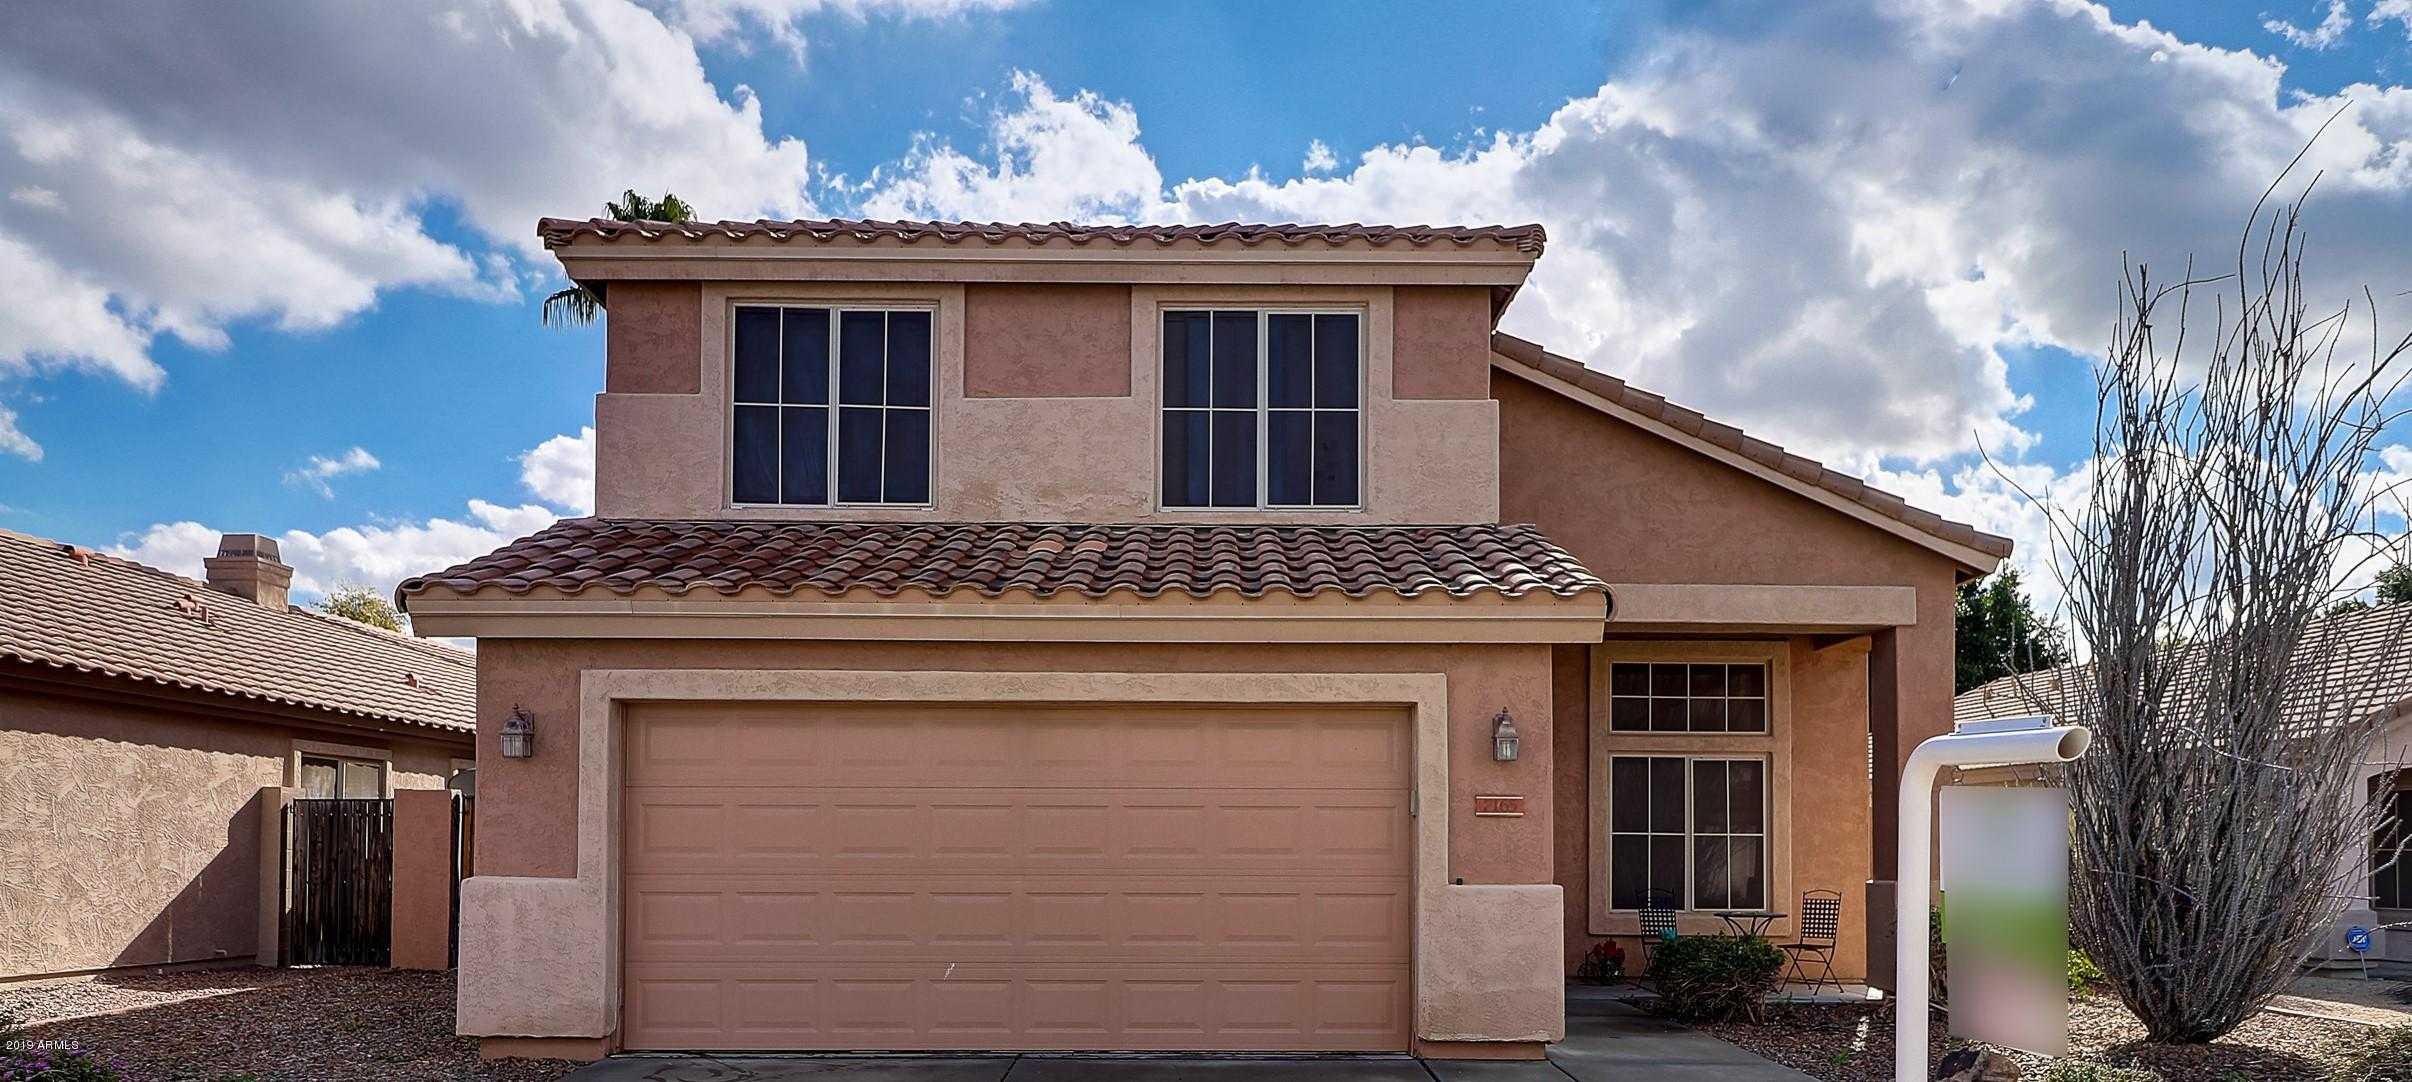 $345,000 - 4Br/3Ba - Home for Sale in Valencia, Glendale